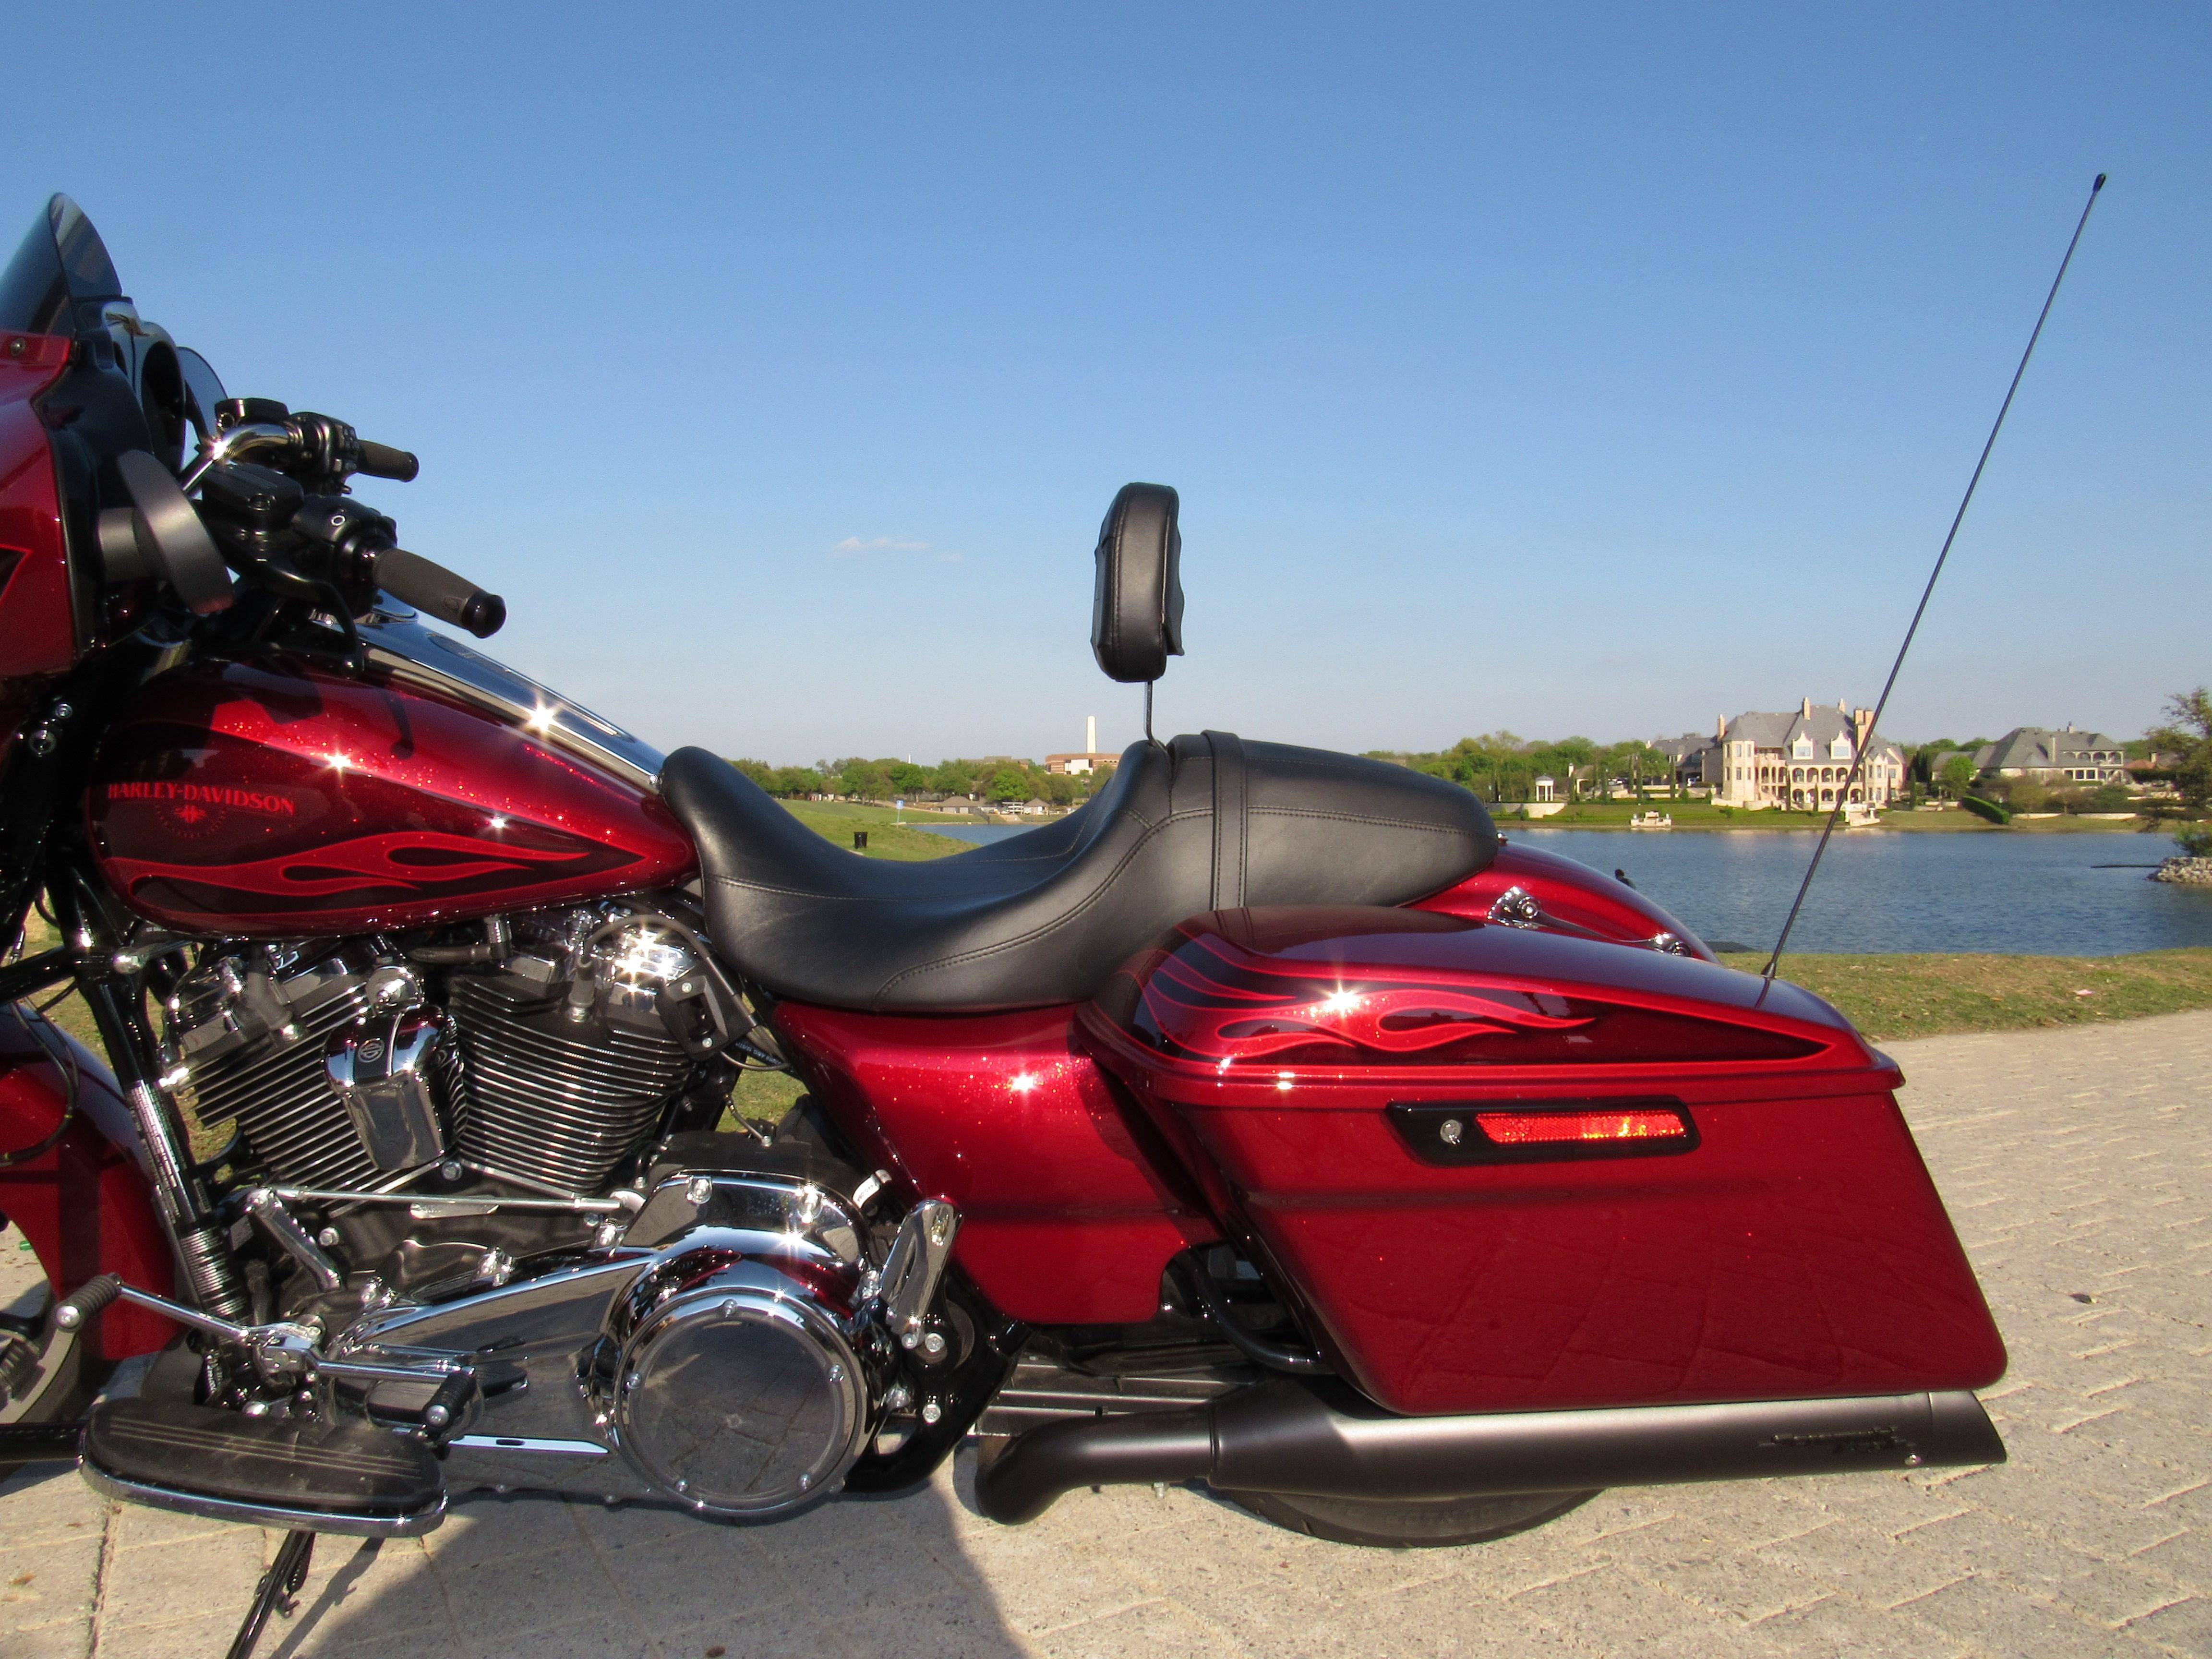 2017 Harley Davidson 174 Flhxs Street Glide 174 Special Hard